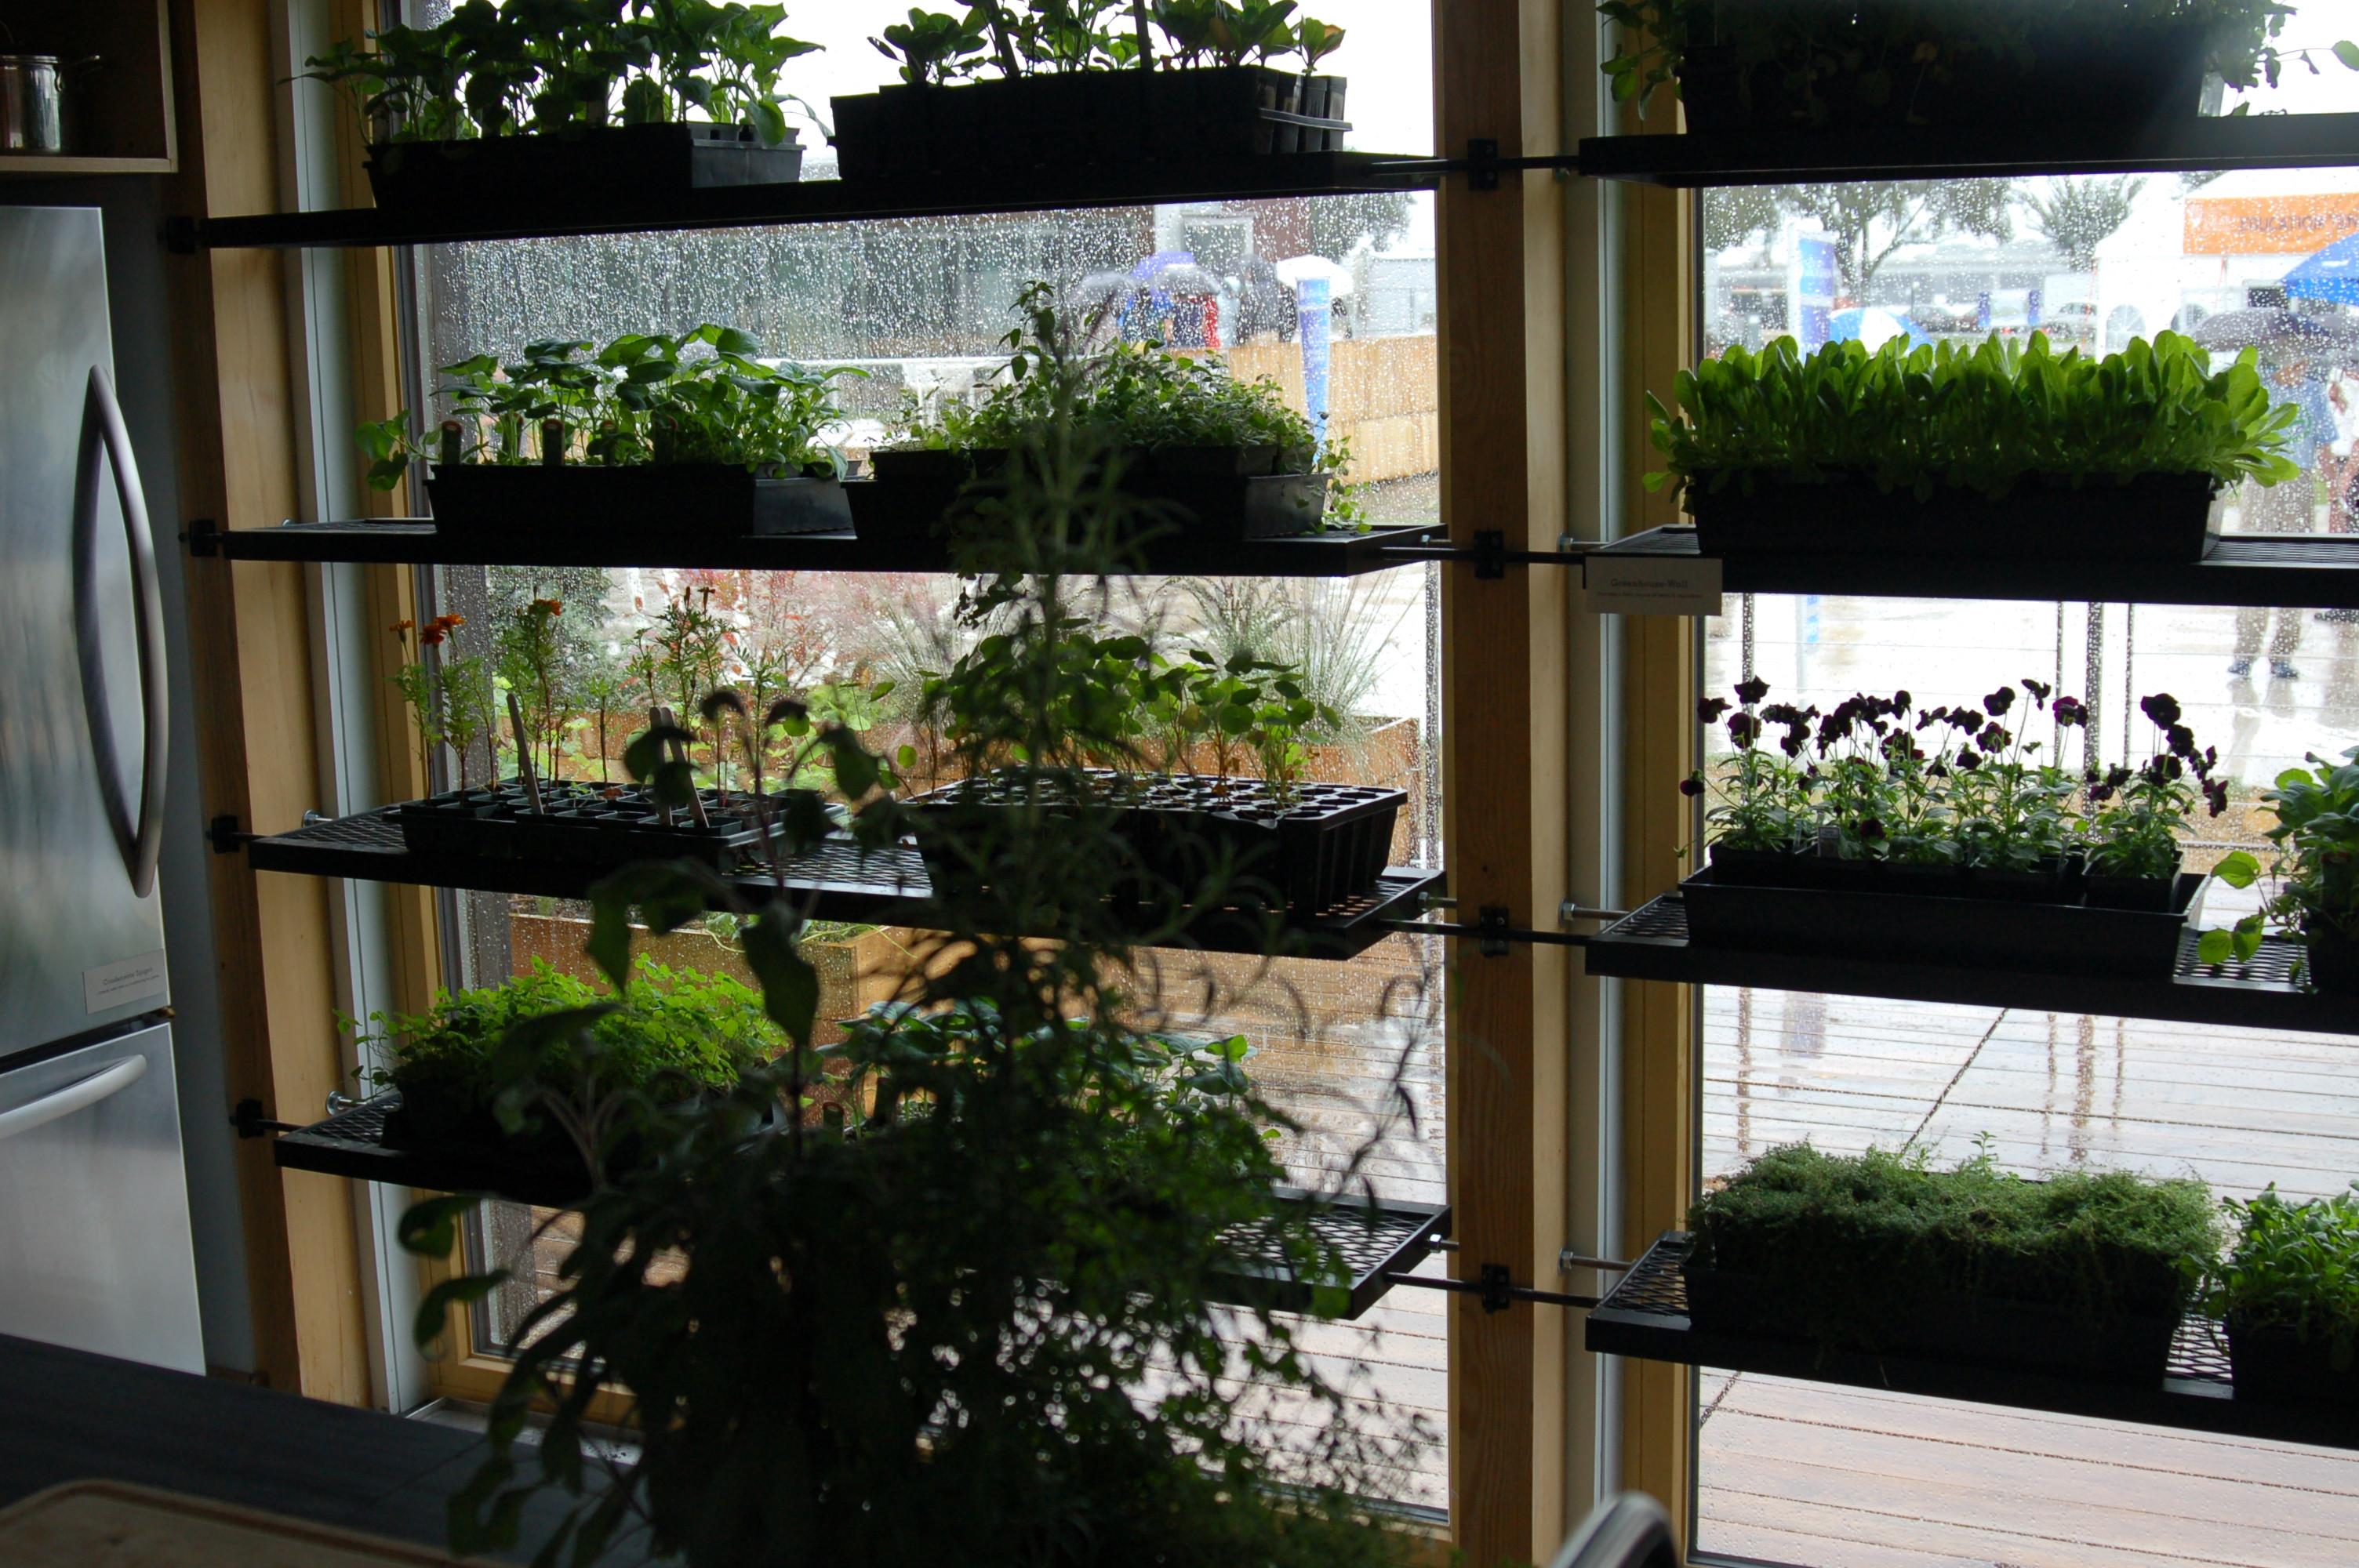 kitchen greenhouse window kohler faucet solar decathlon 2011 in a deluge arlington passivhaus